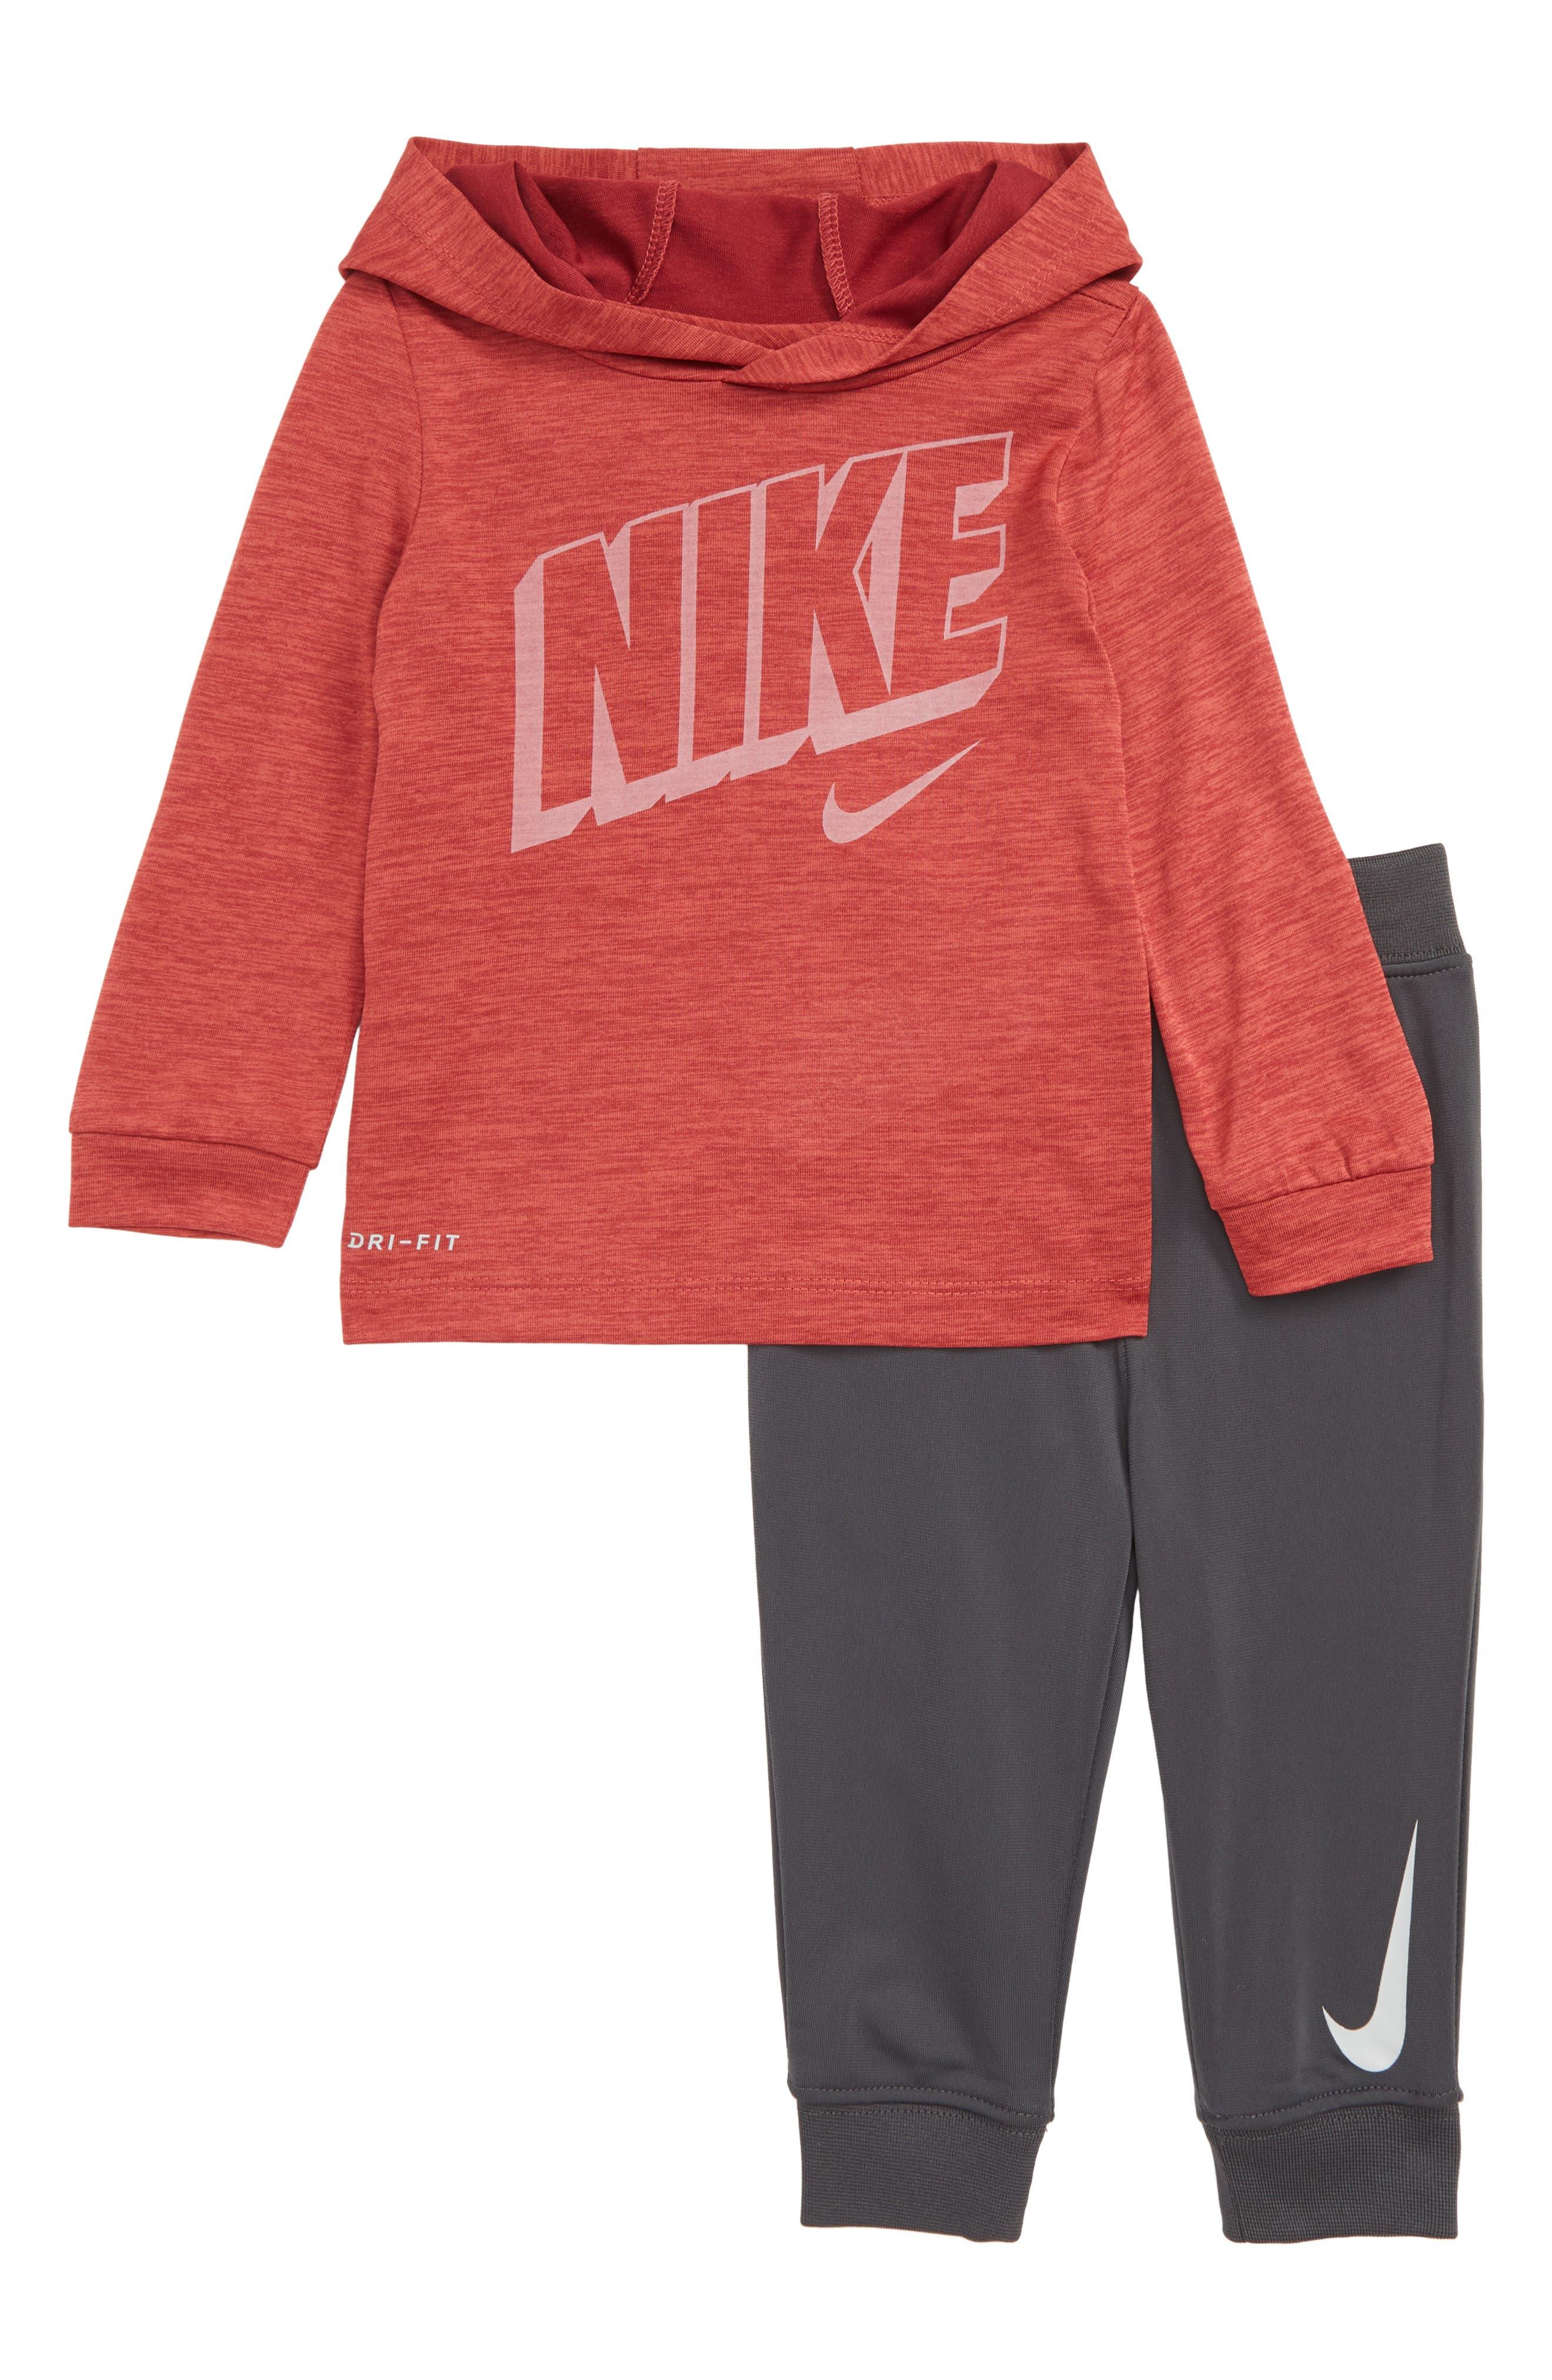 Image of Nike Dri-FIT Hoodie & Jogger Pants Set